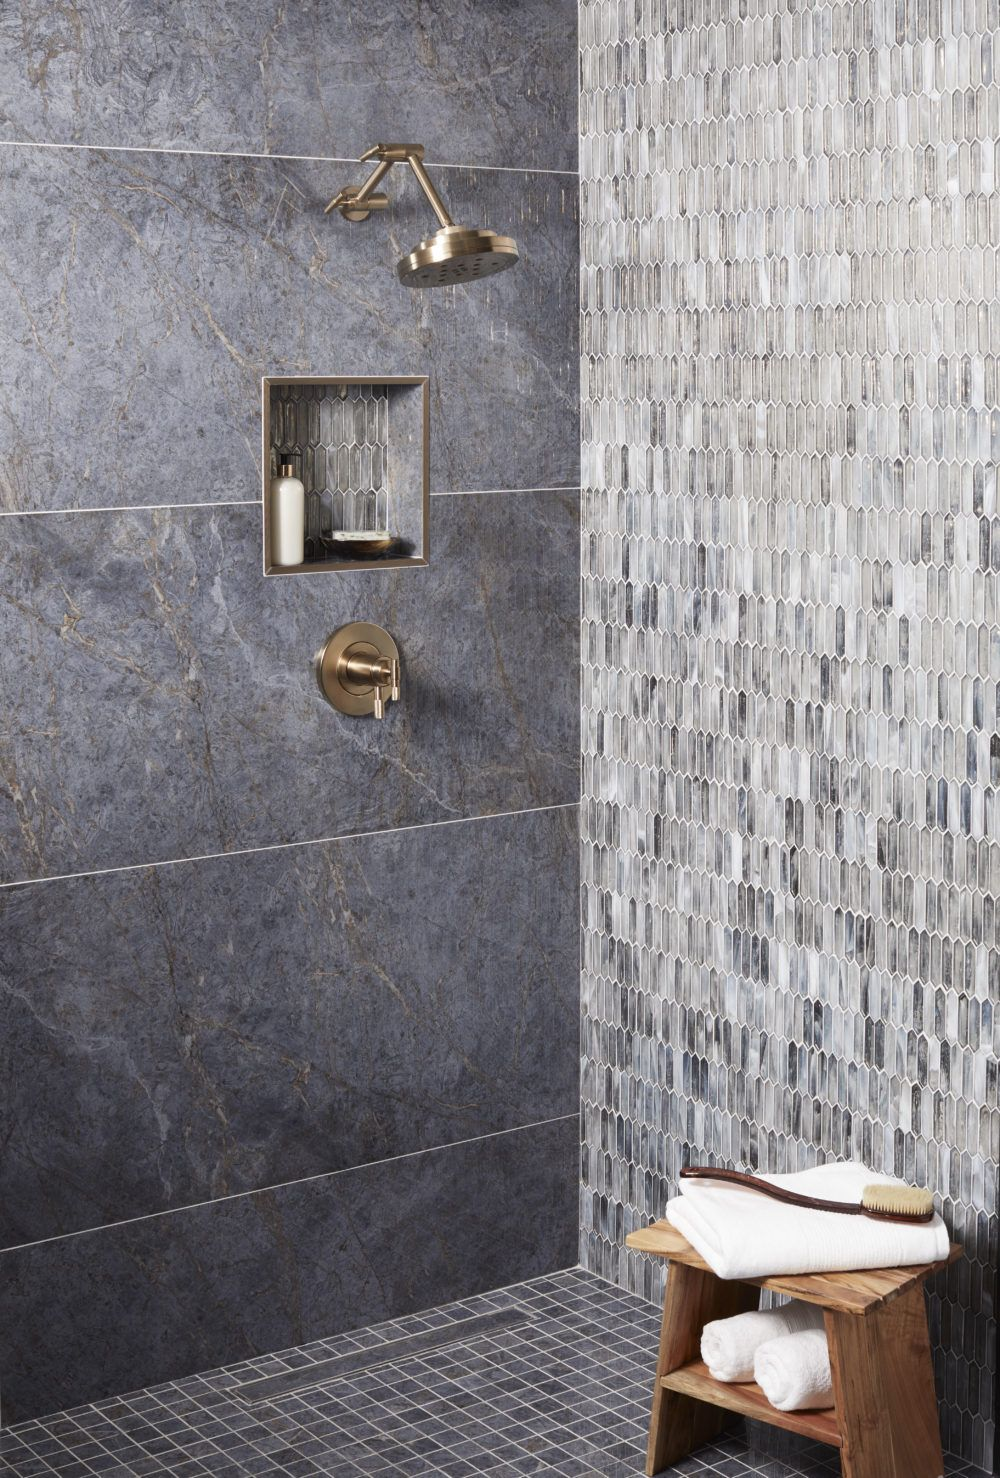 Maximize Your Space With Large Format Tile The Tile Shop Blog Glass Tile Bathroom Tile Bathroom Shower Remodel